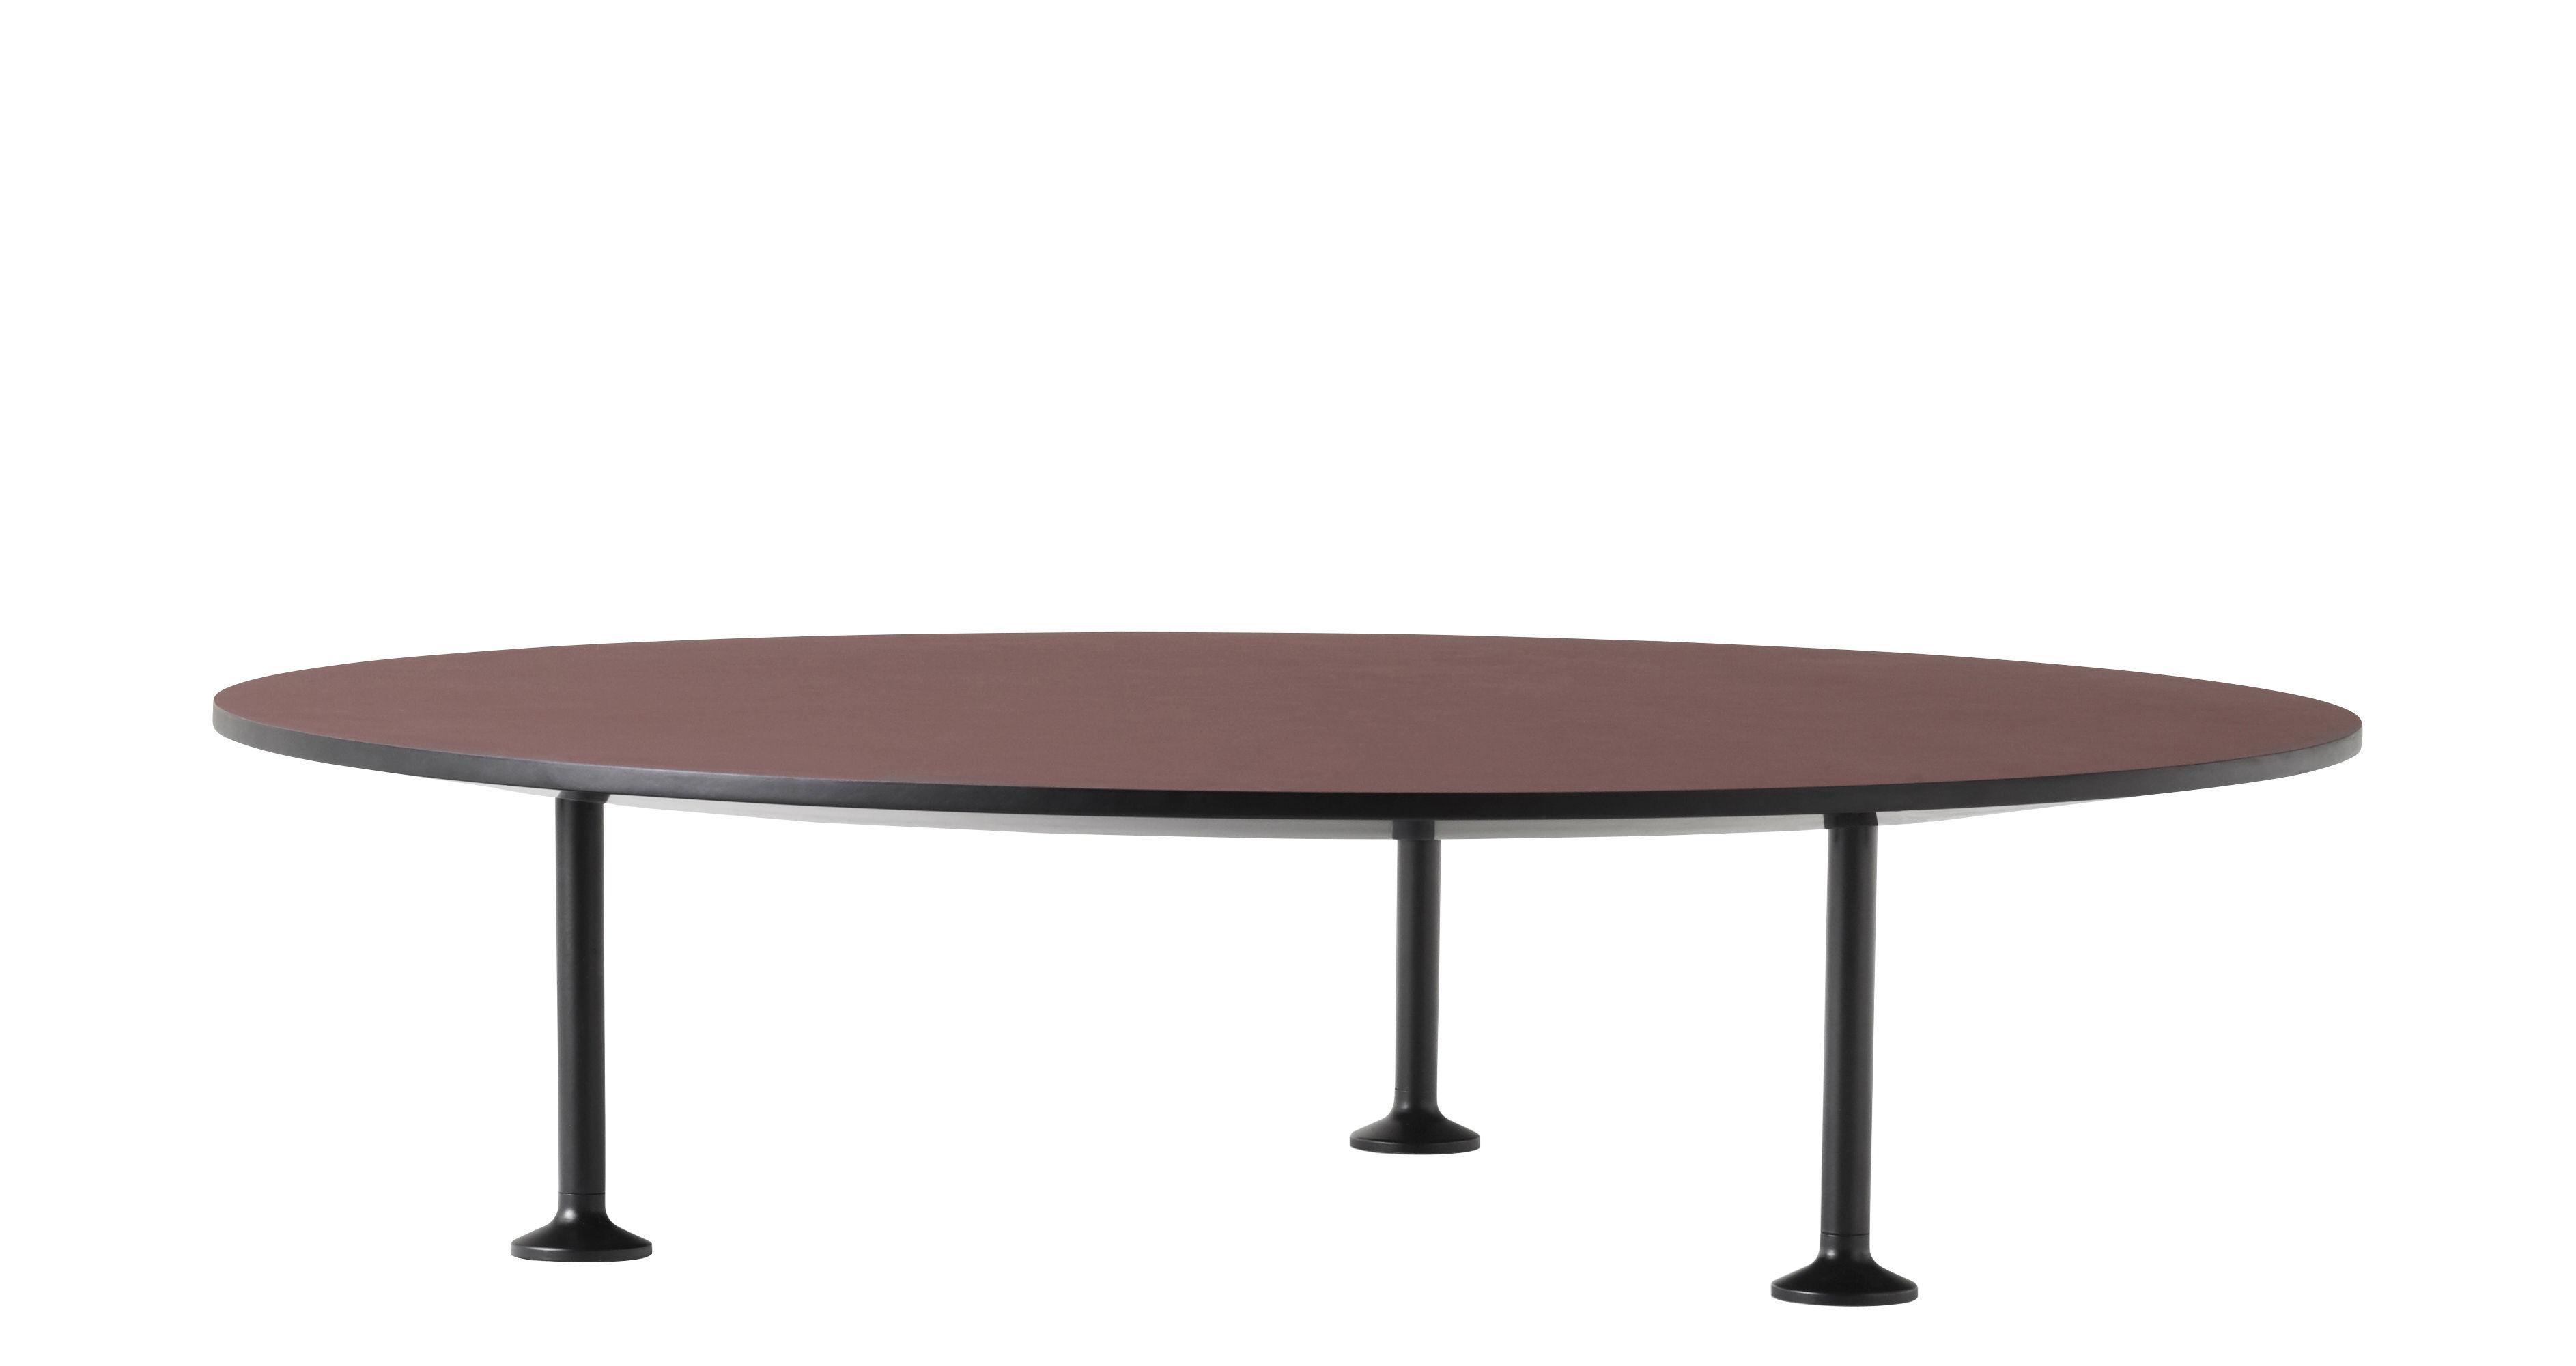 Arredamento - Tavolini  - Tavolino basso Godot / Ø 90 cm - Linoleum - Menu - Bordò / Gambe nere - Acciaio verniciato, Linoleum, MDF